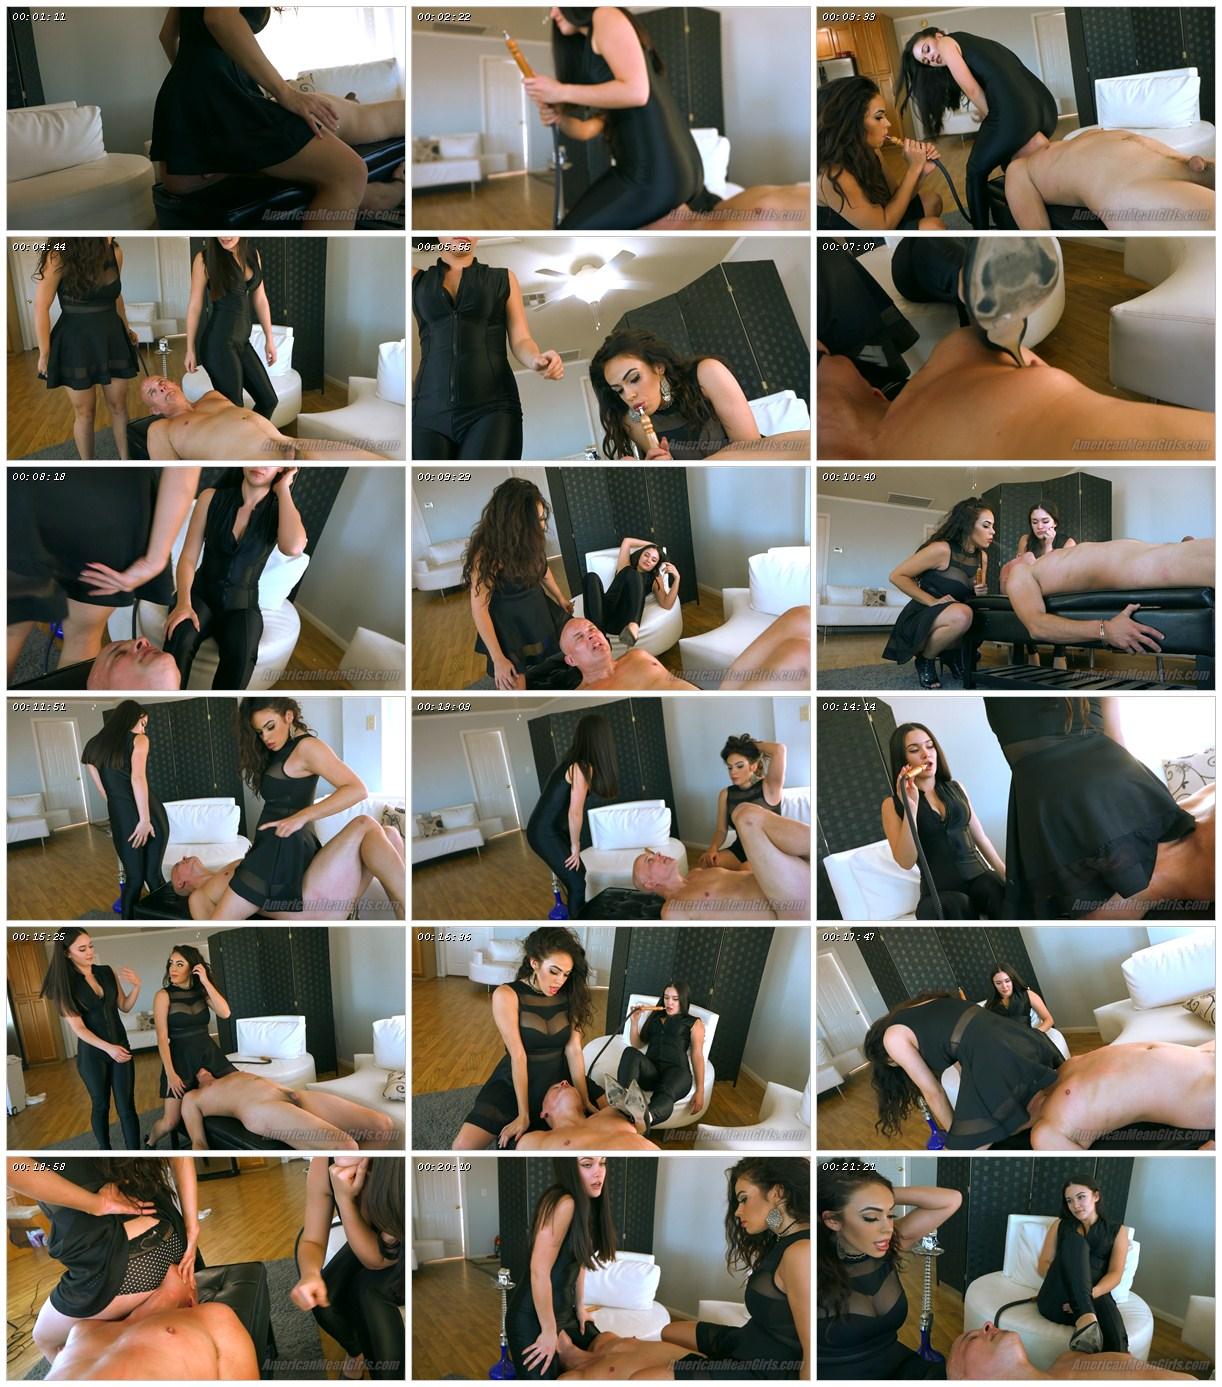 83063267_smoking_0197_carmela-and-adrianna-your-just-a-cunt-cushion_thumb.jpg